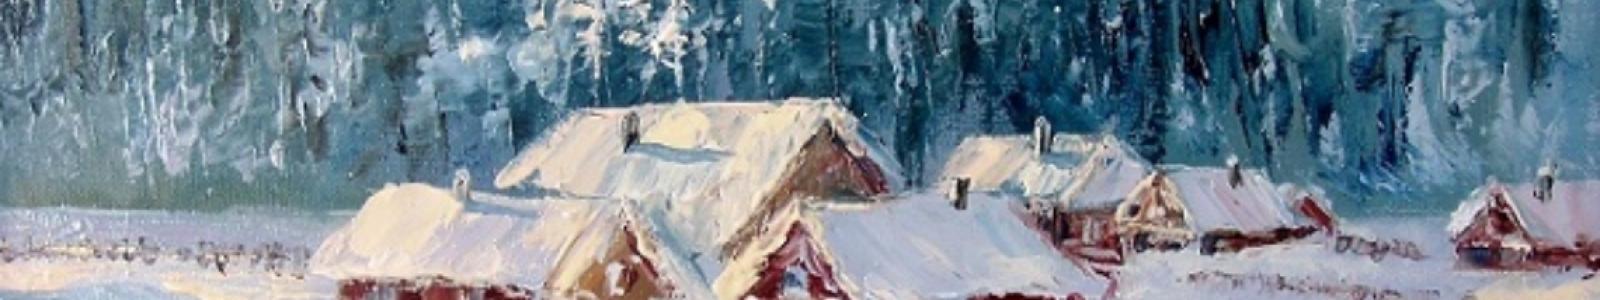 Gallery Elena Zorina